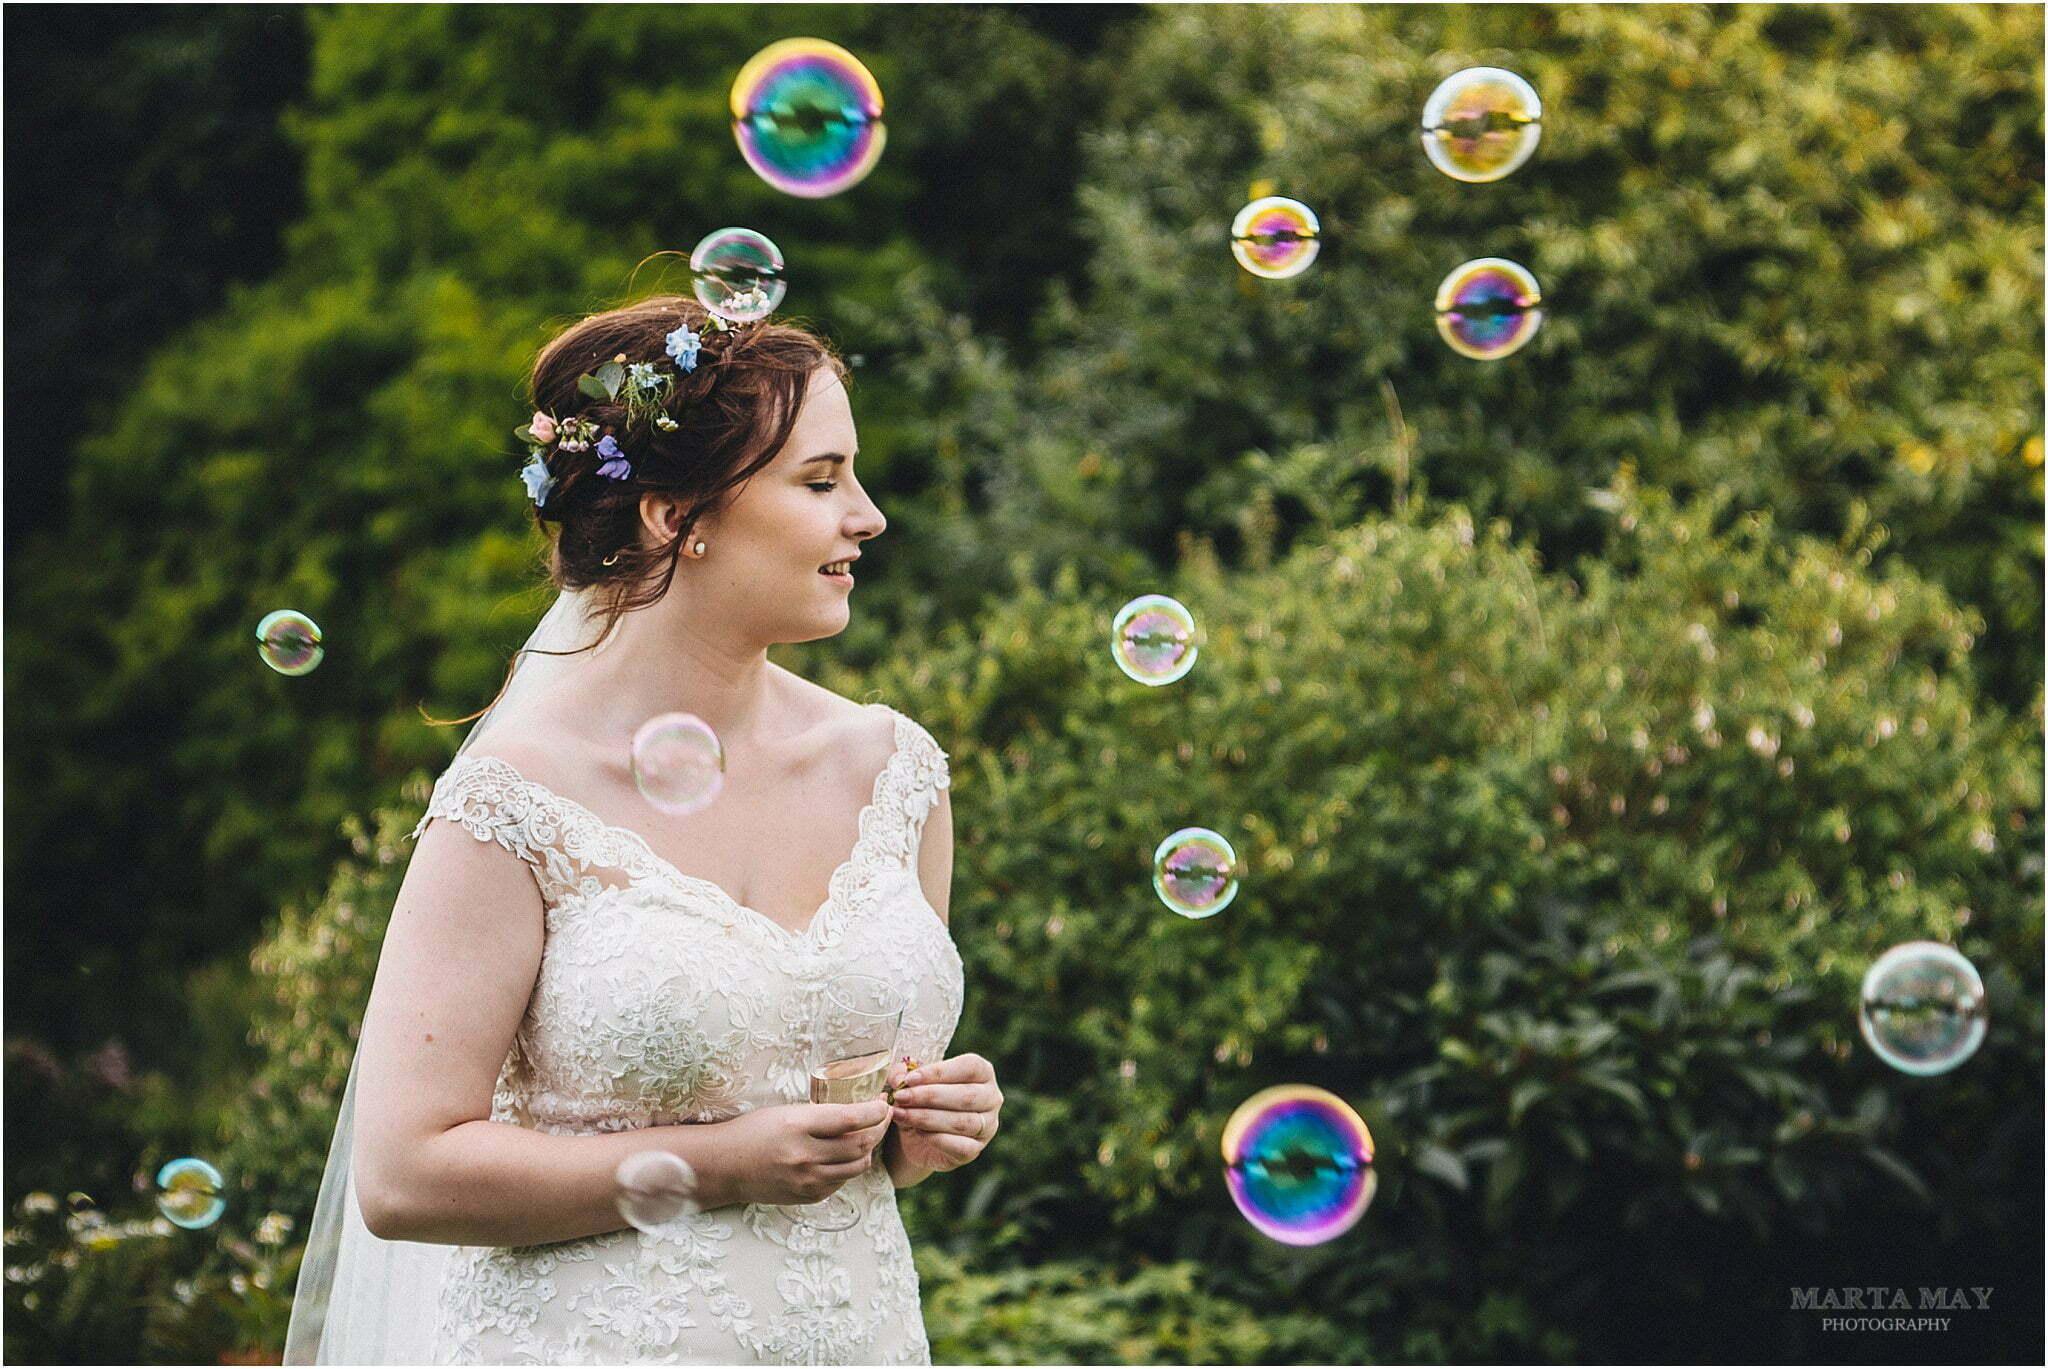 Bride at Lyde Arundel